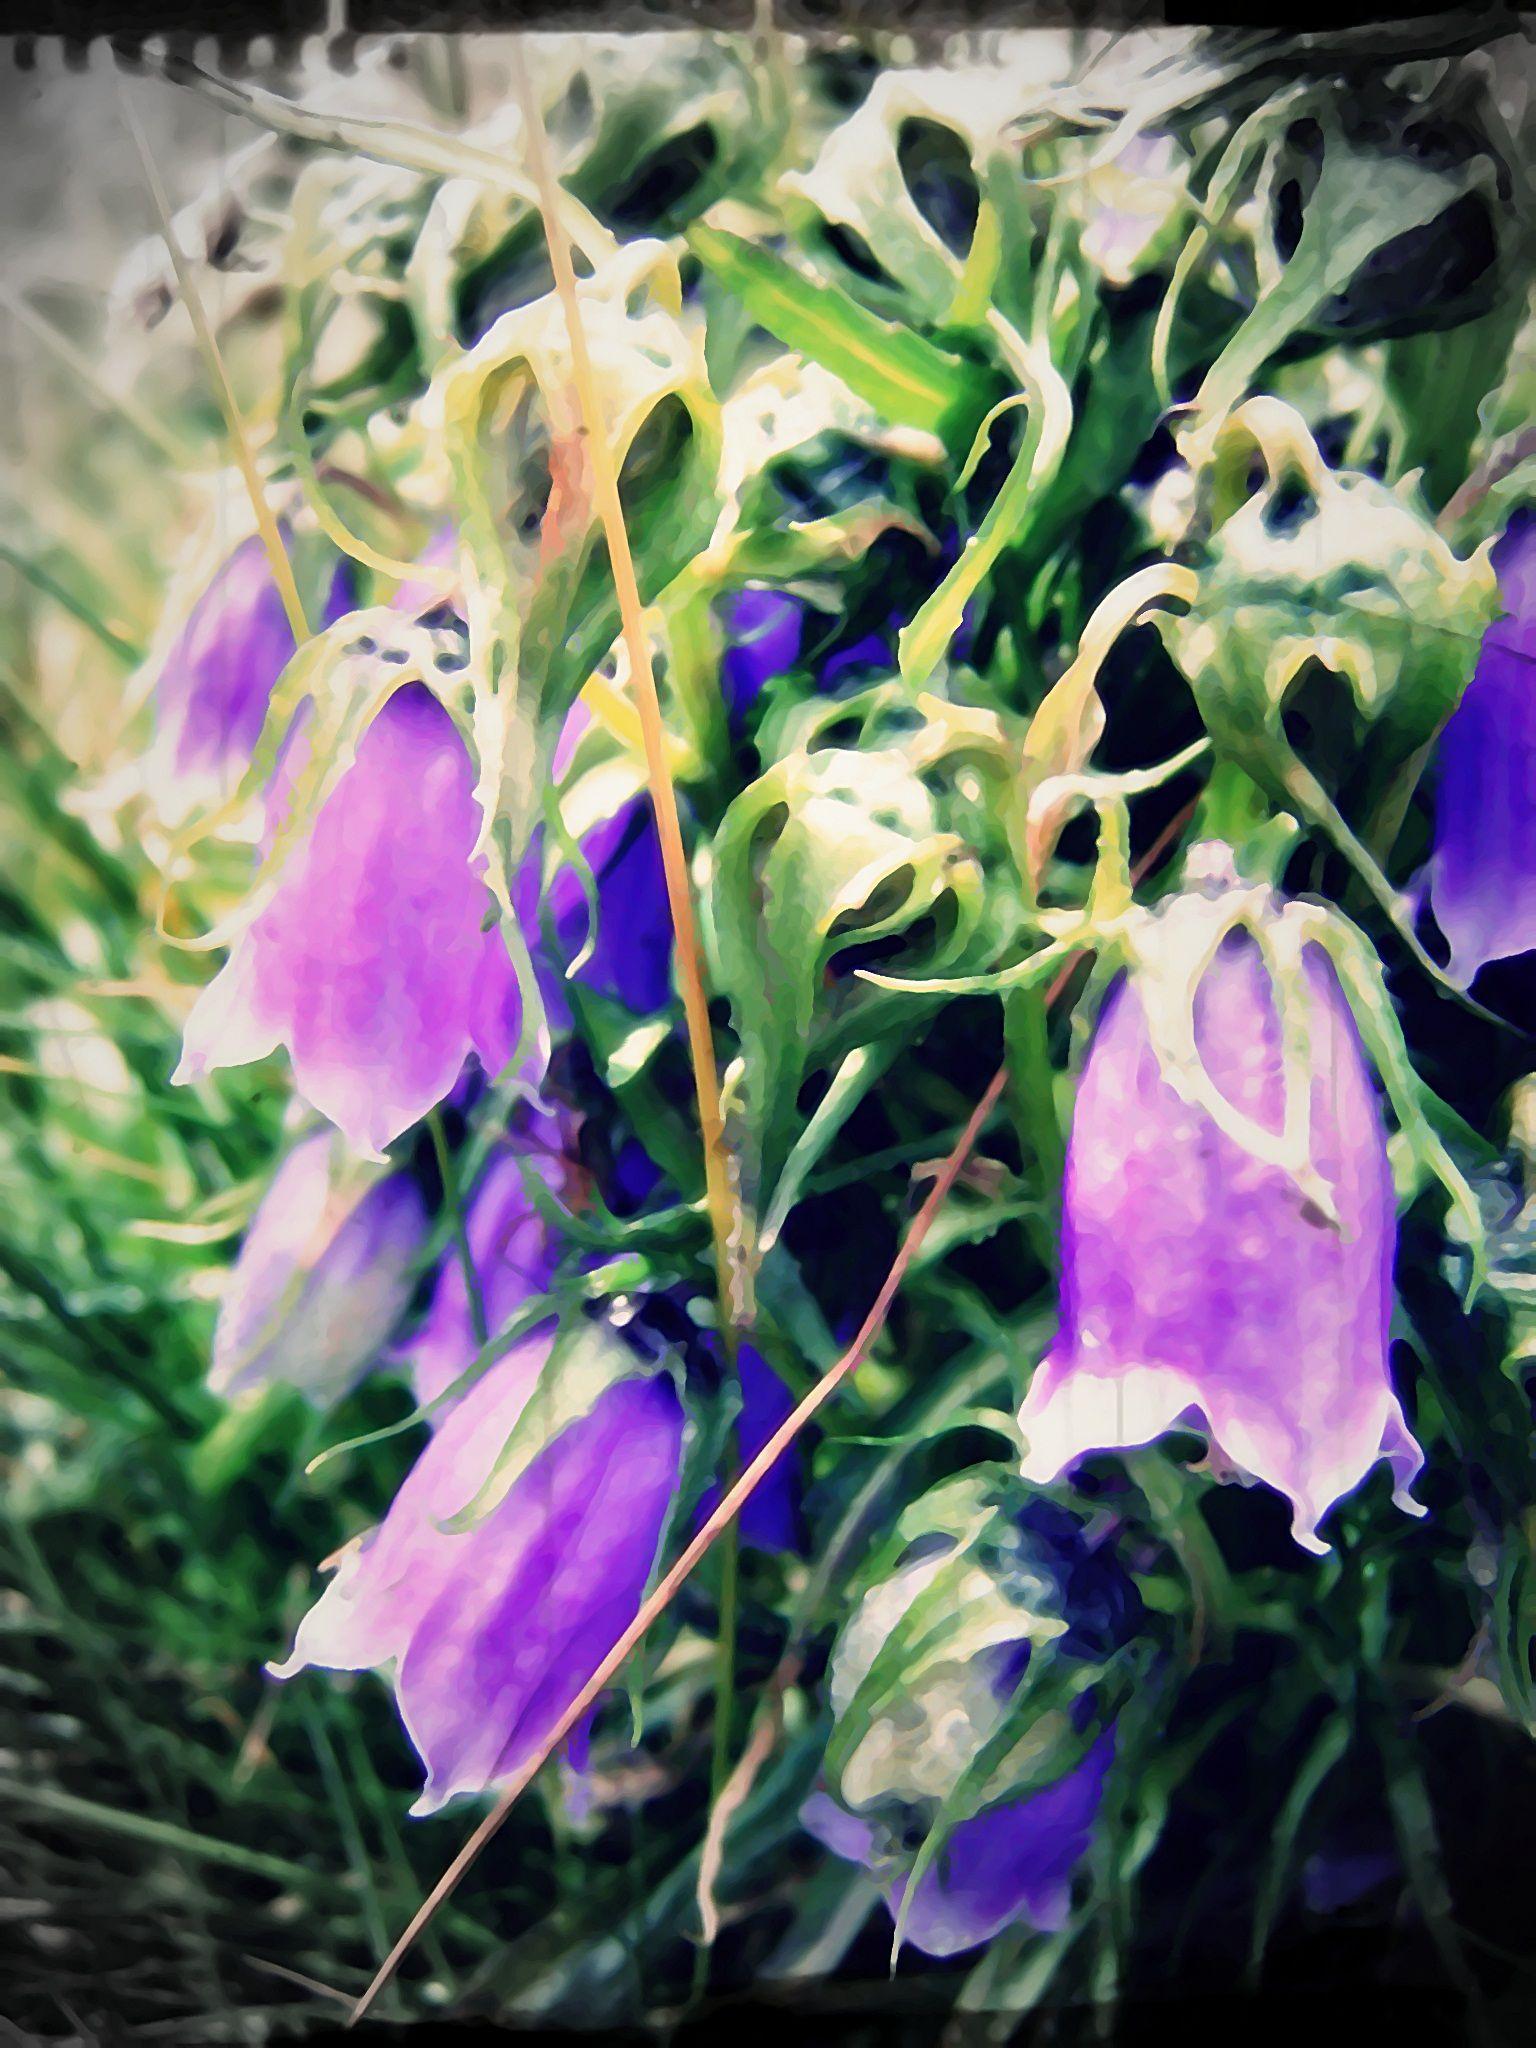 flora of the Tatra mountains